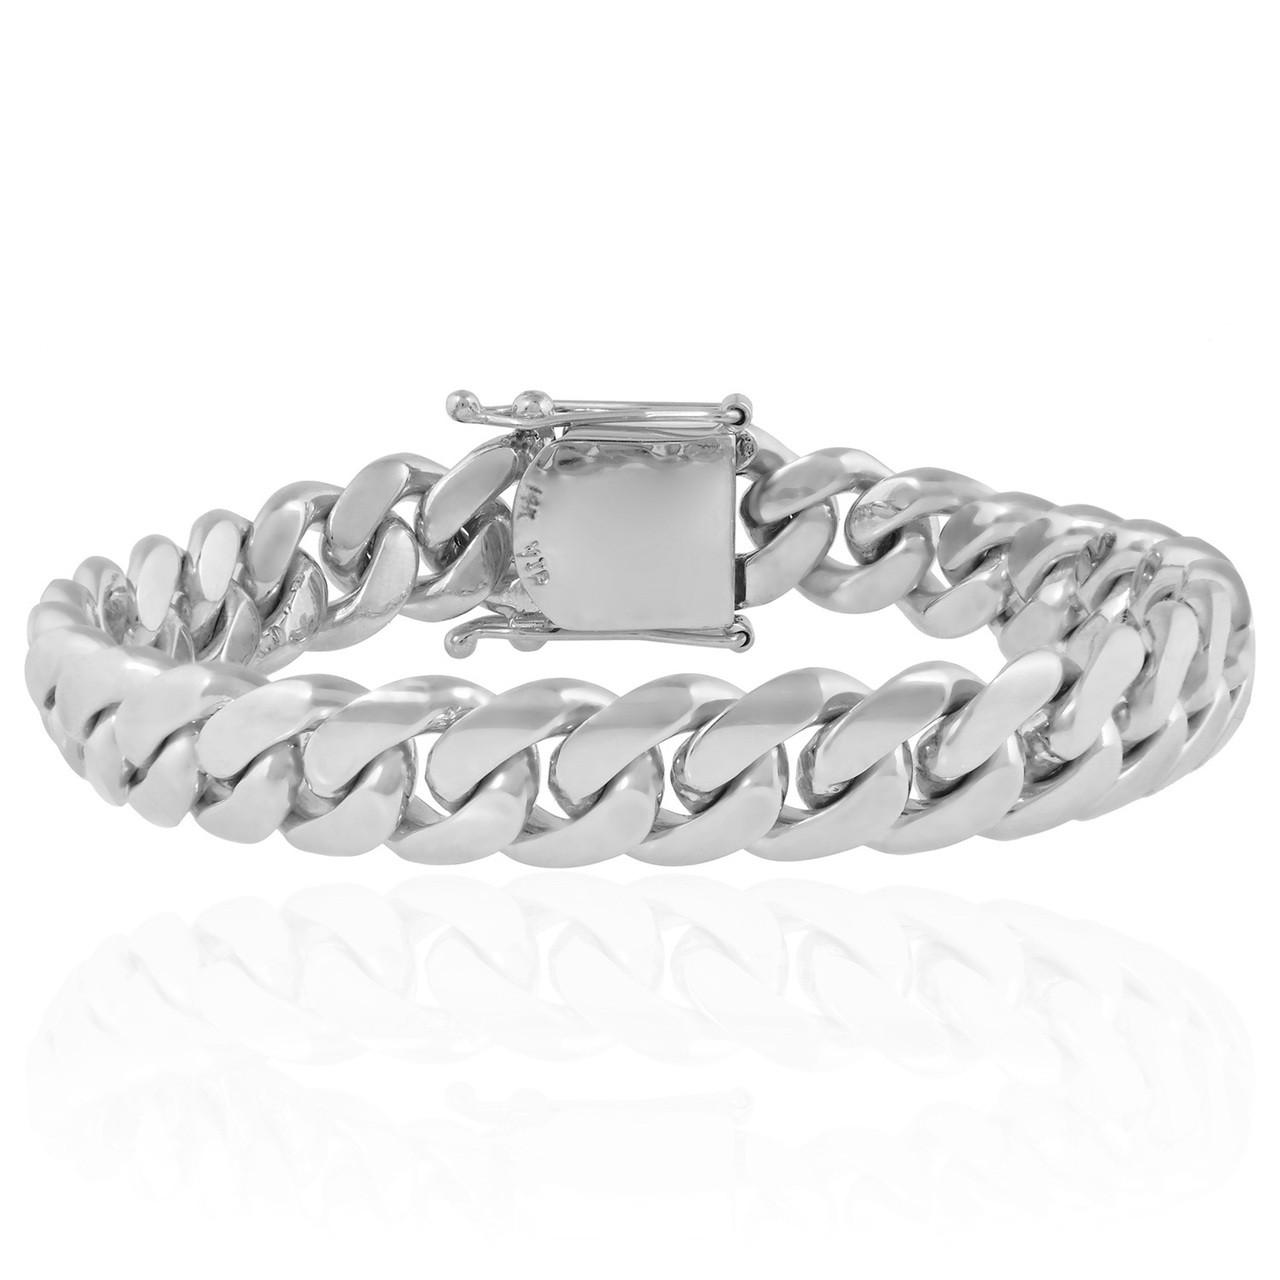 fe6c8cf0428 14K White Gold Cuban Link Bracelet 16mm - Shyne Jewelers